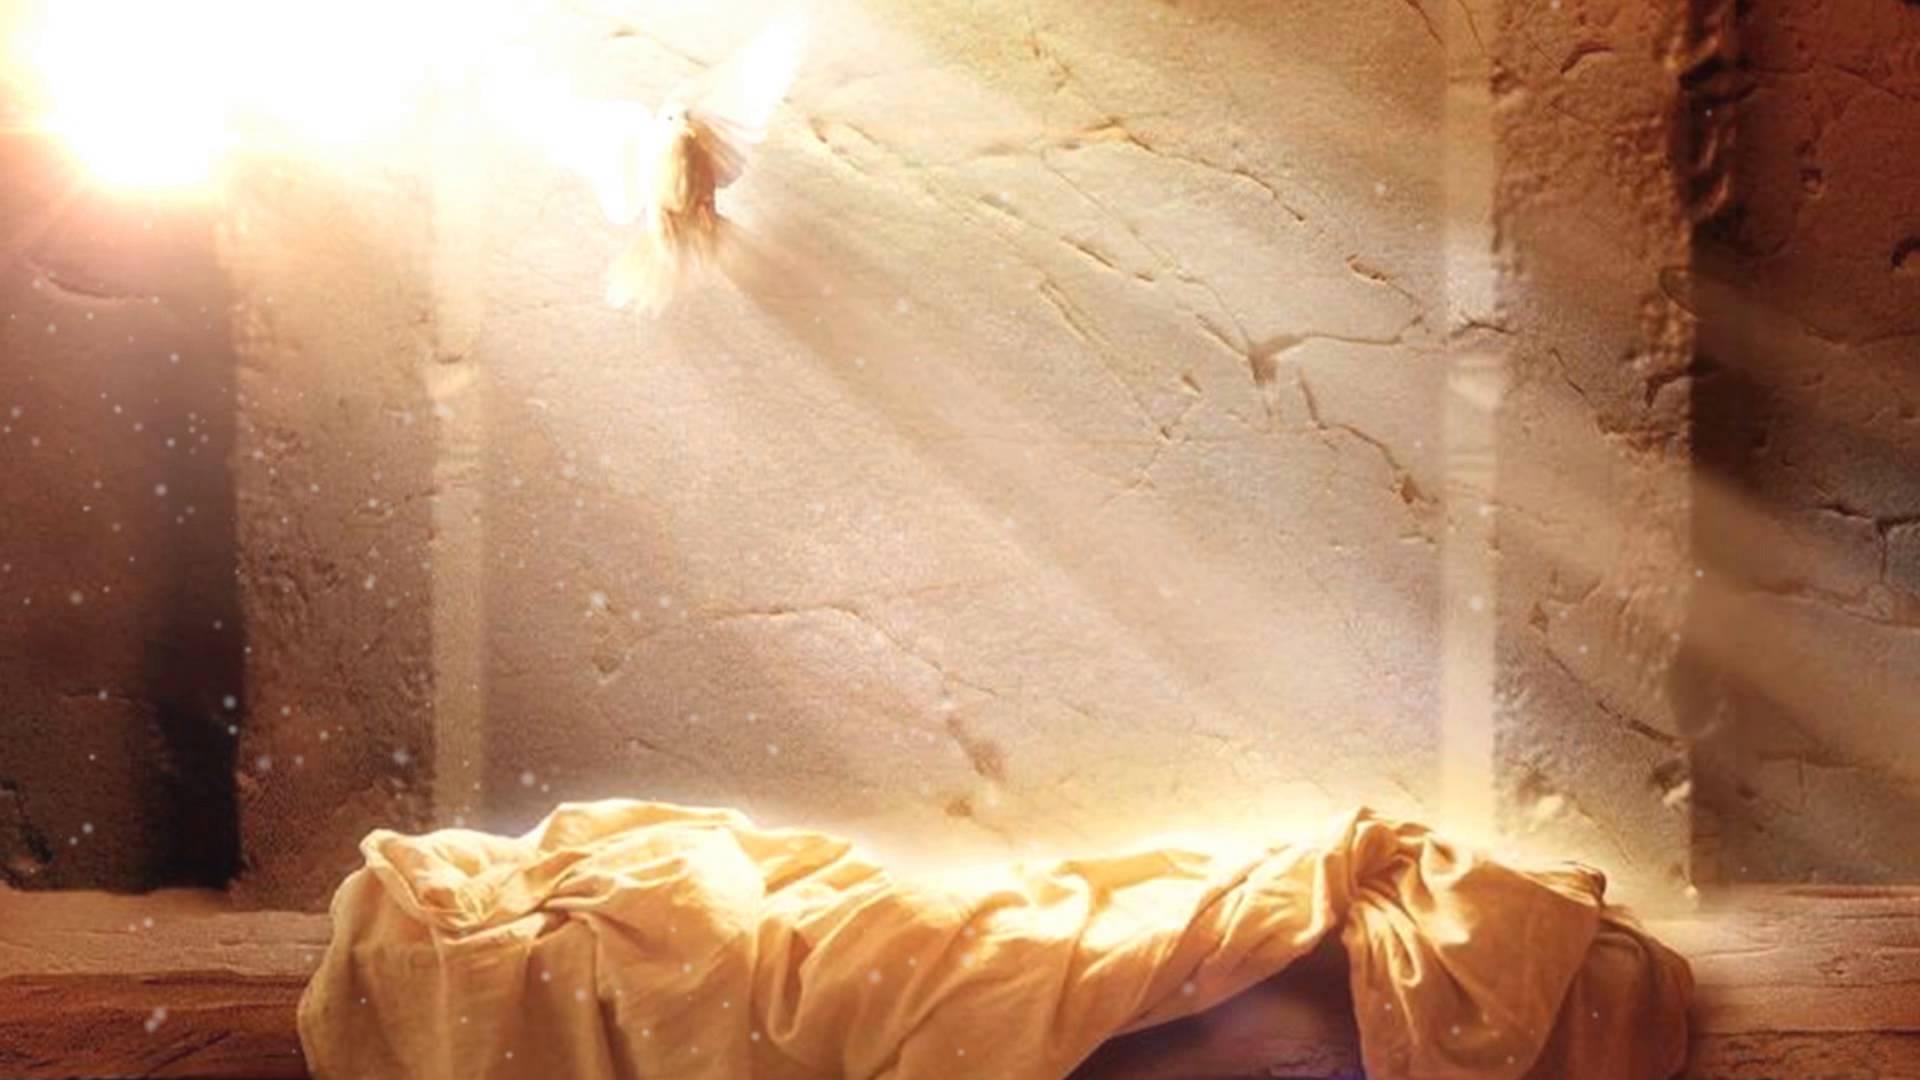 Easter Video loop HD Worship Background Resurrection 1920x1080